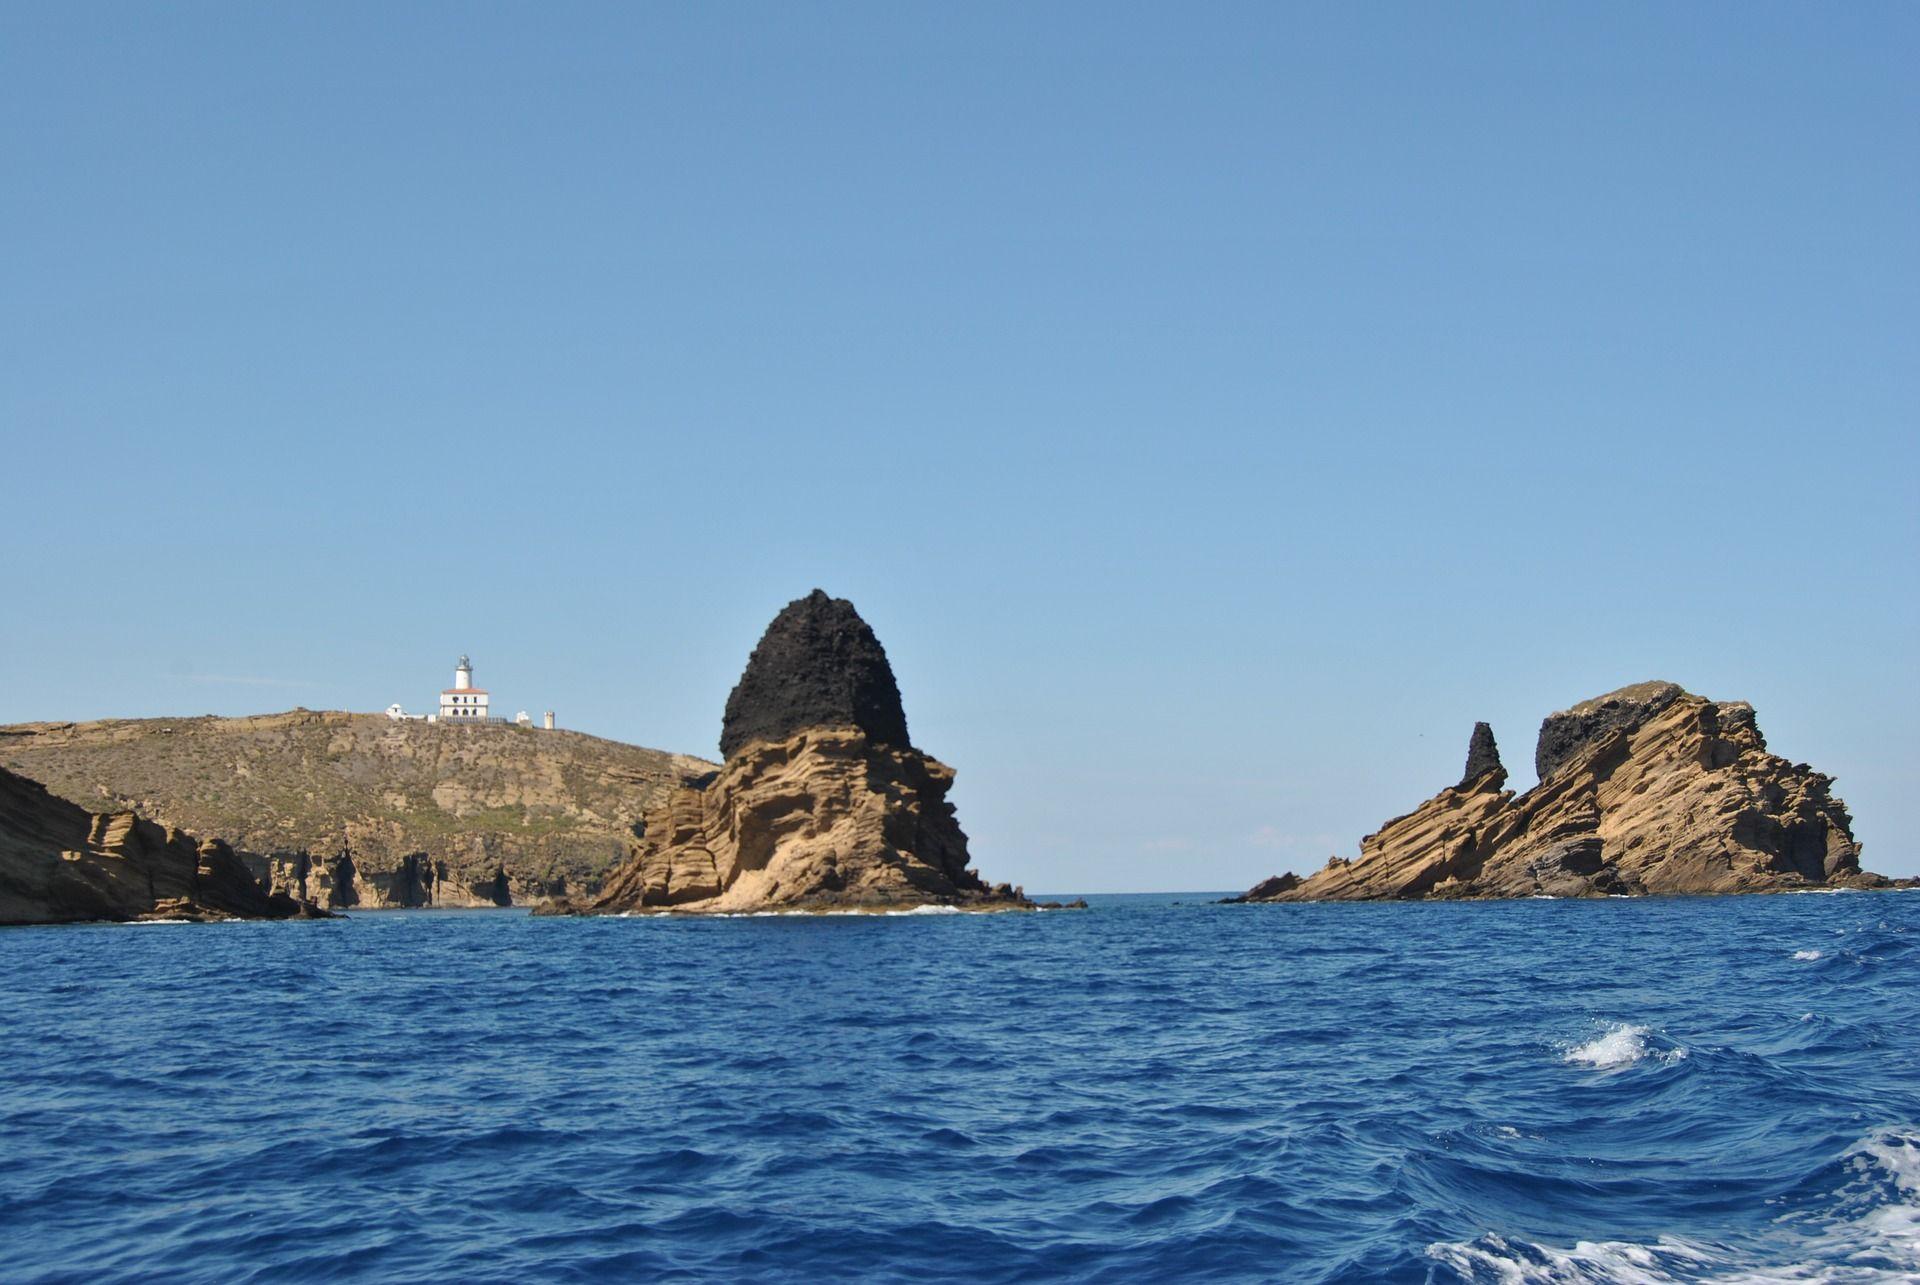 Bono Viaje Comunitat Valenciana: Programa Viatgem.